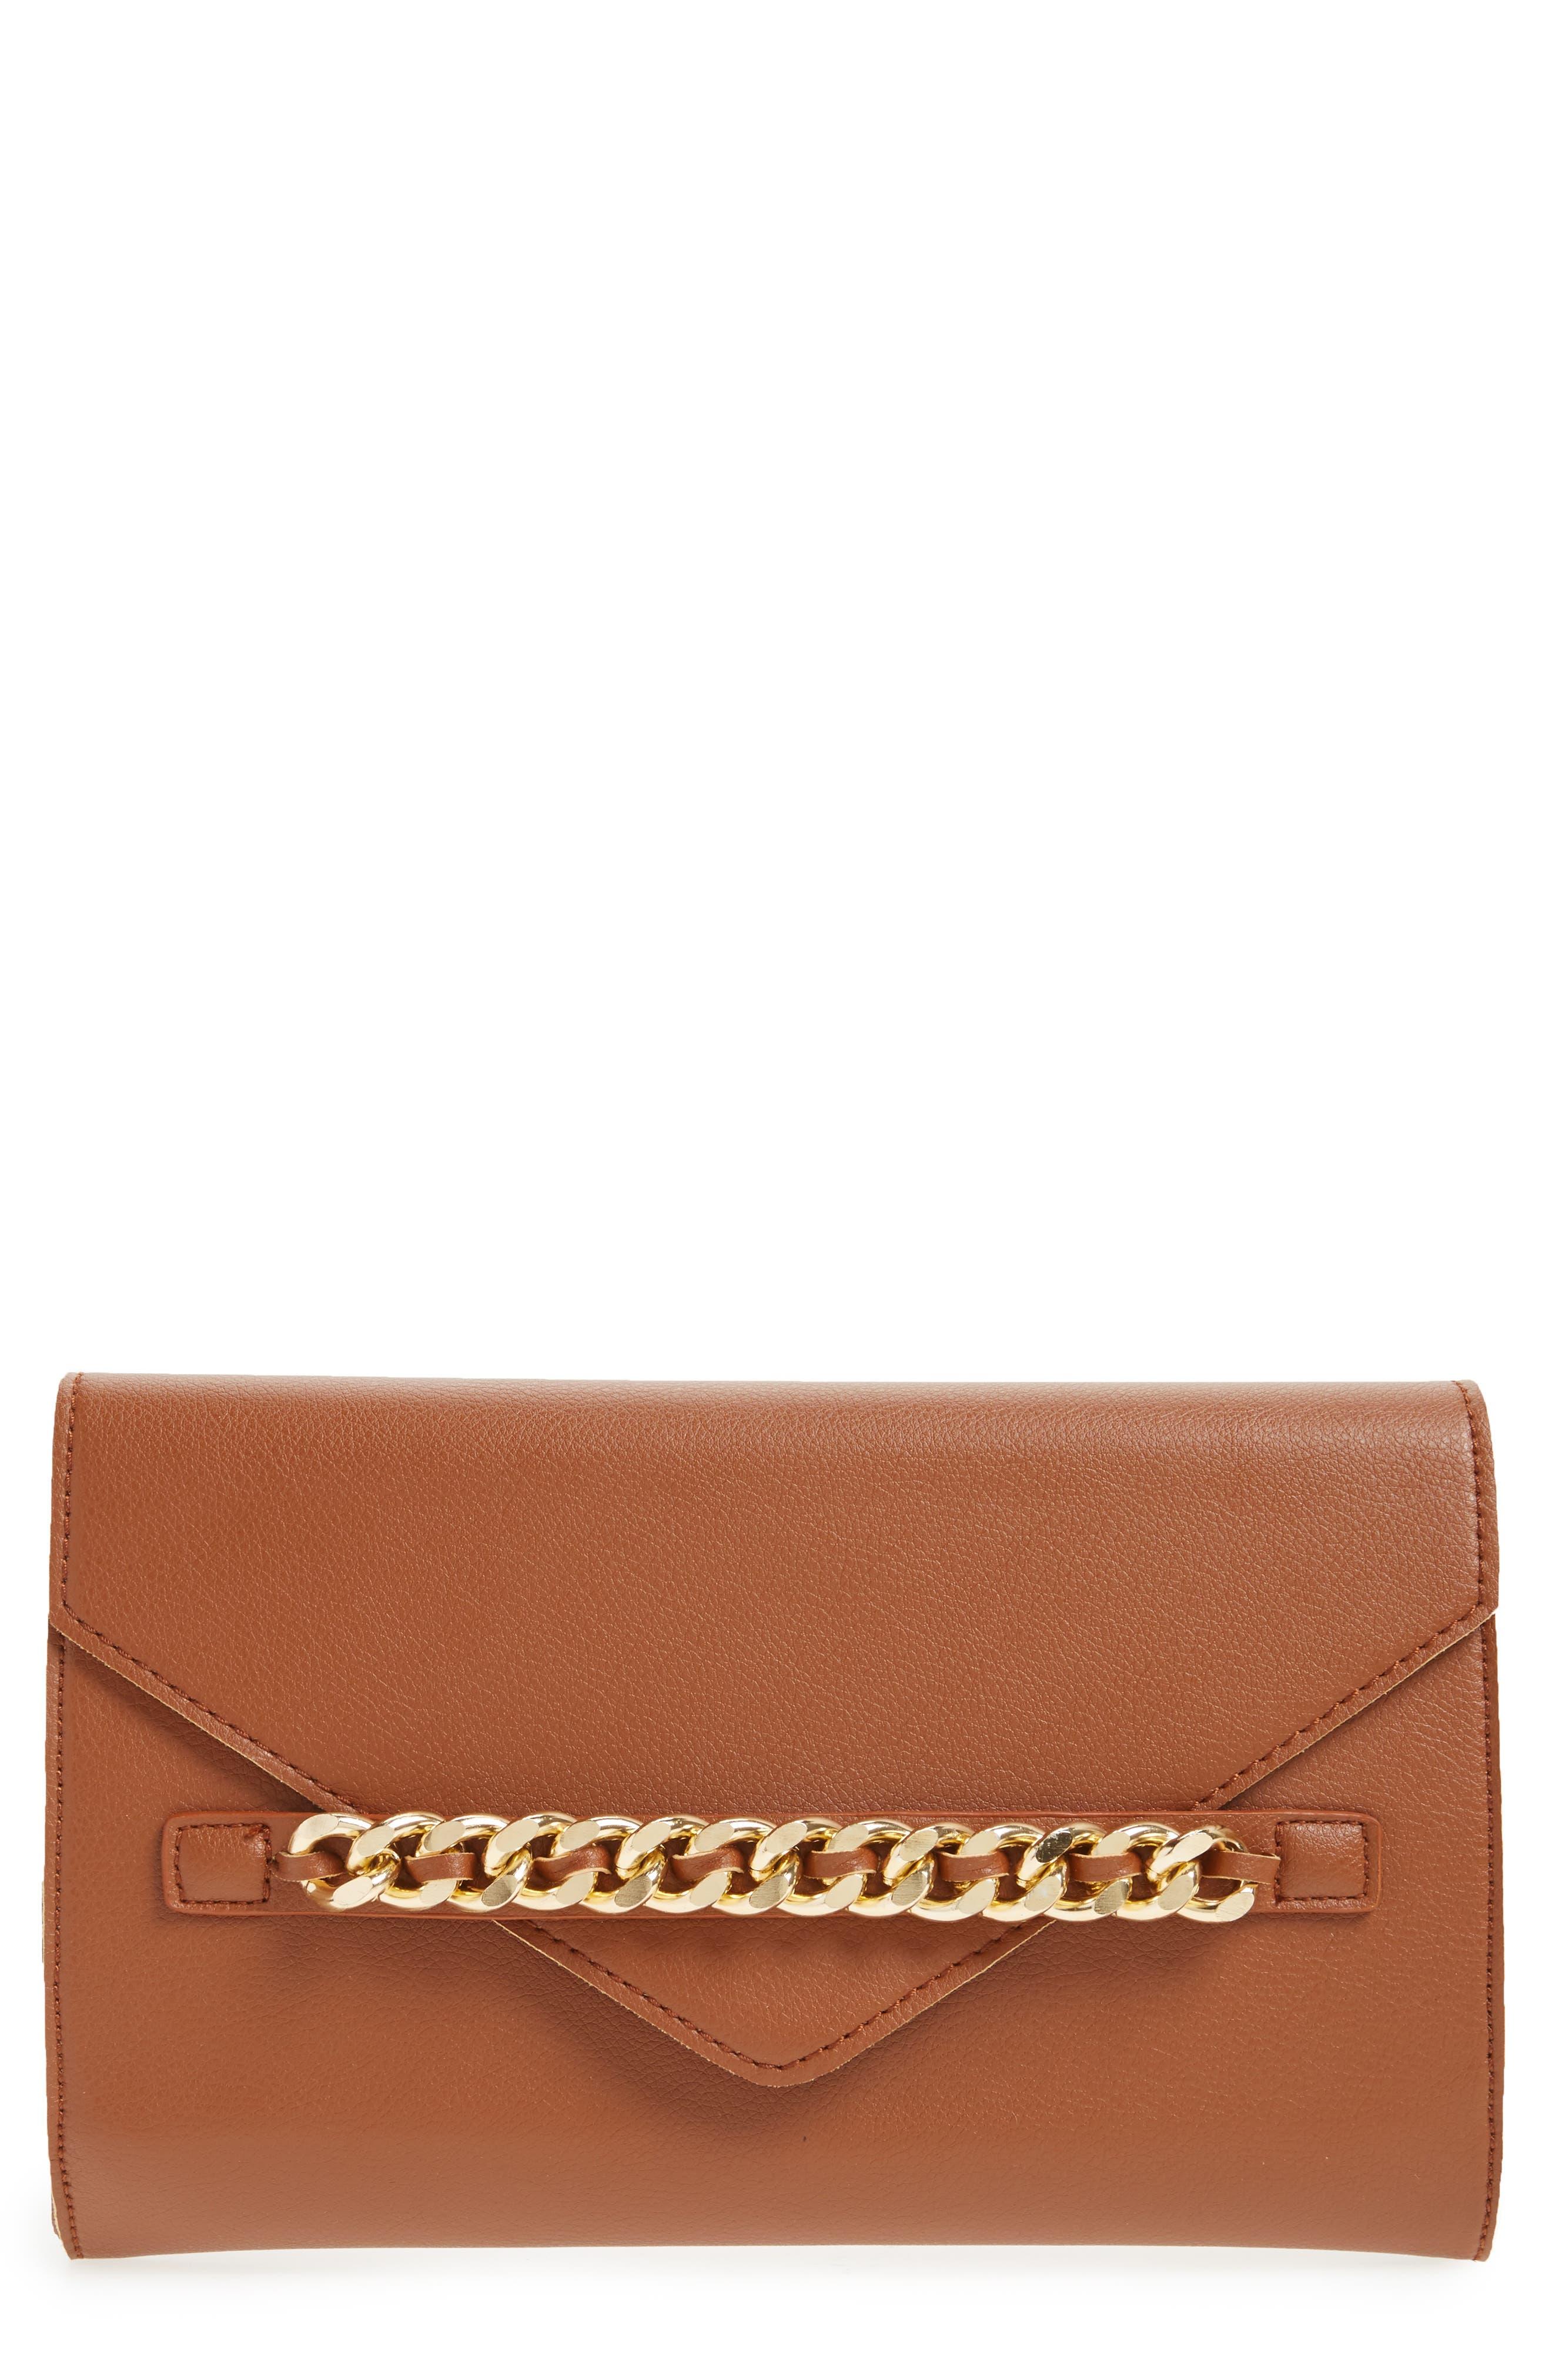 BP. Chain Faux Leather Envelope Clutch